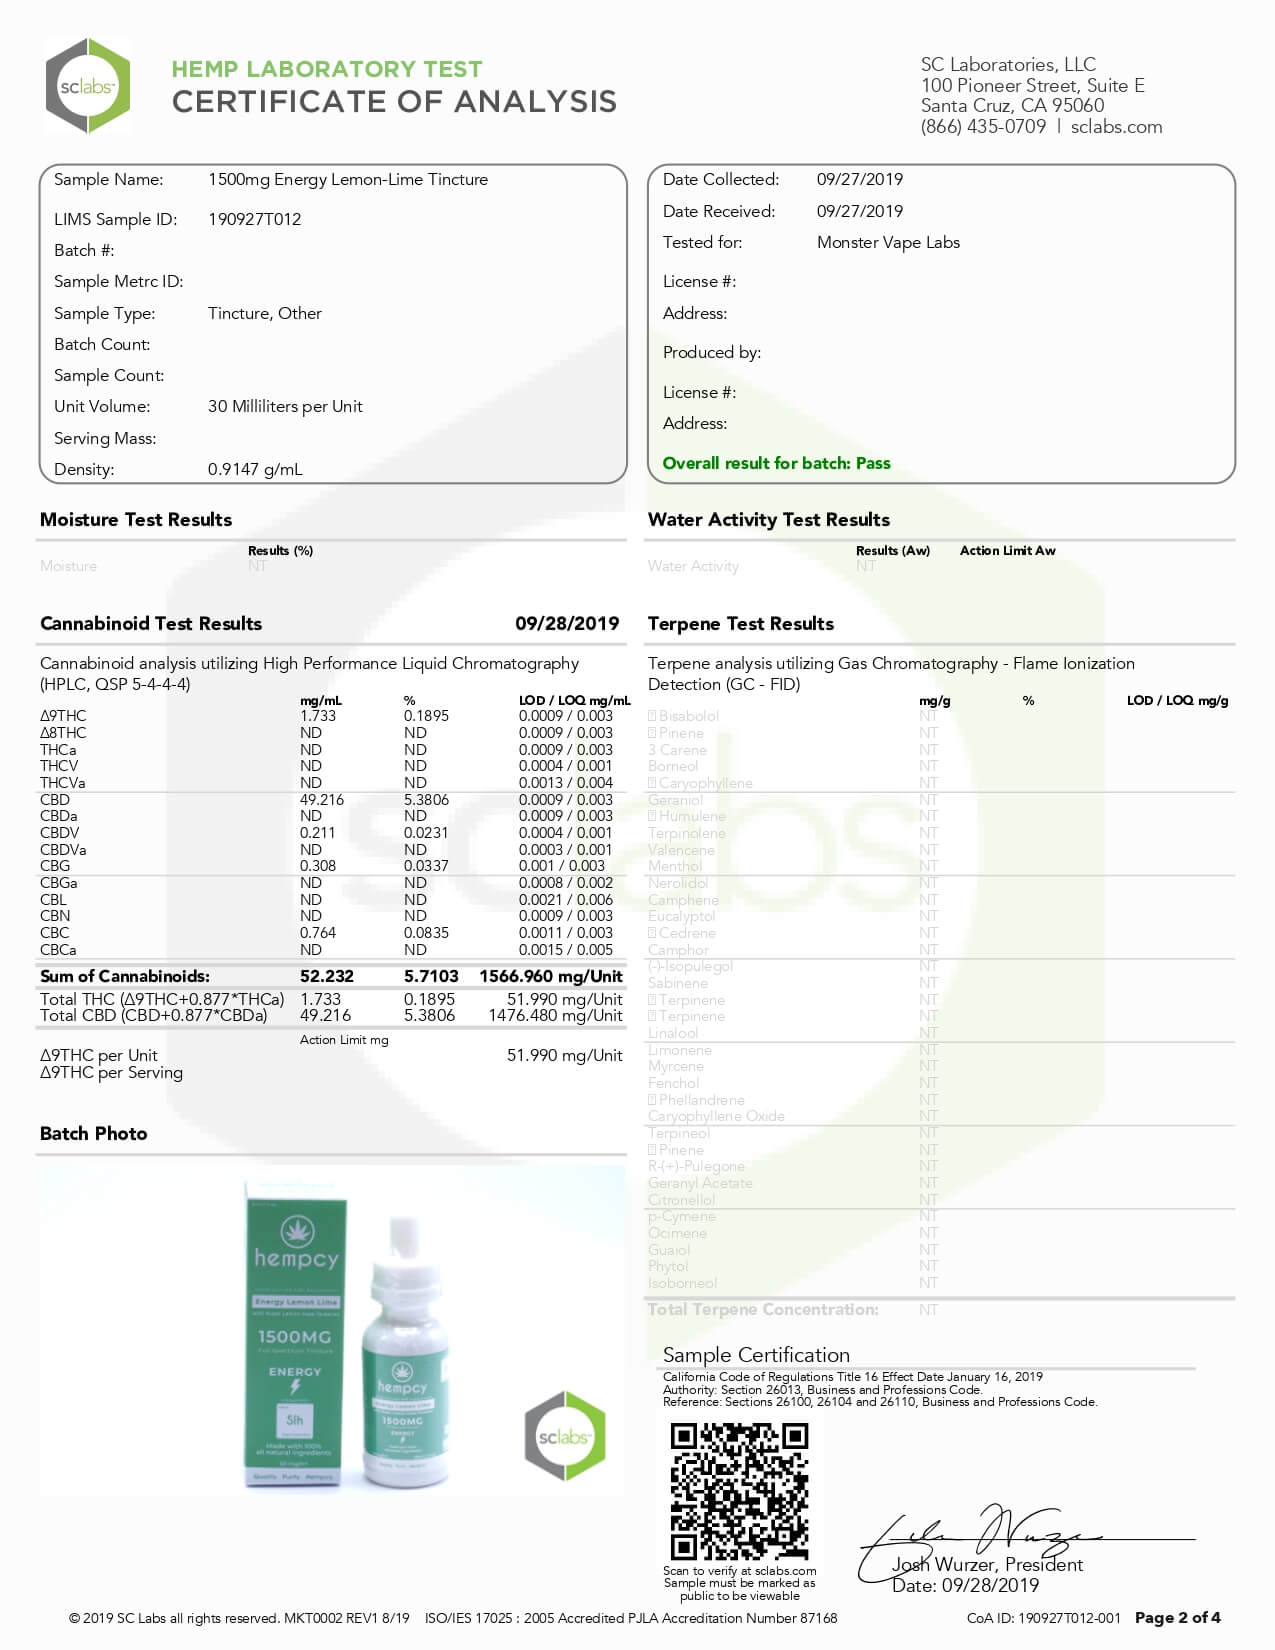 Hempcy CBD Tincture Energy Lemon Lime 1500mg Lab Report